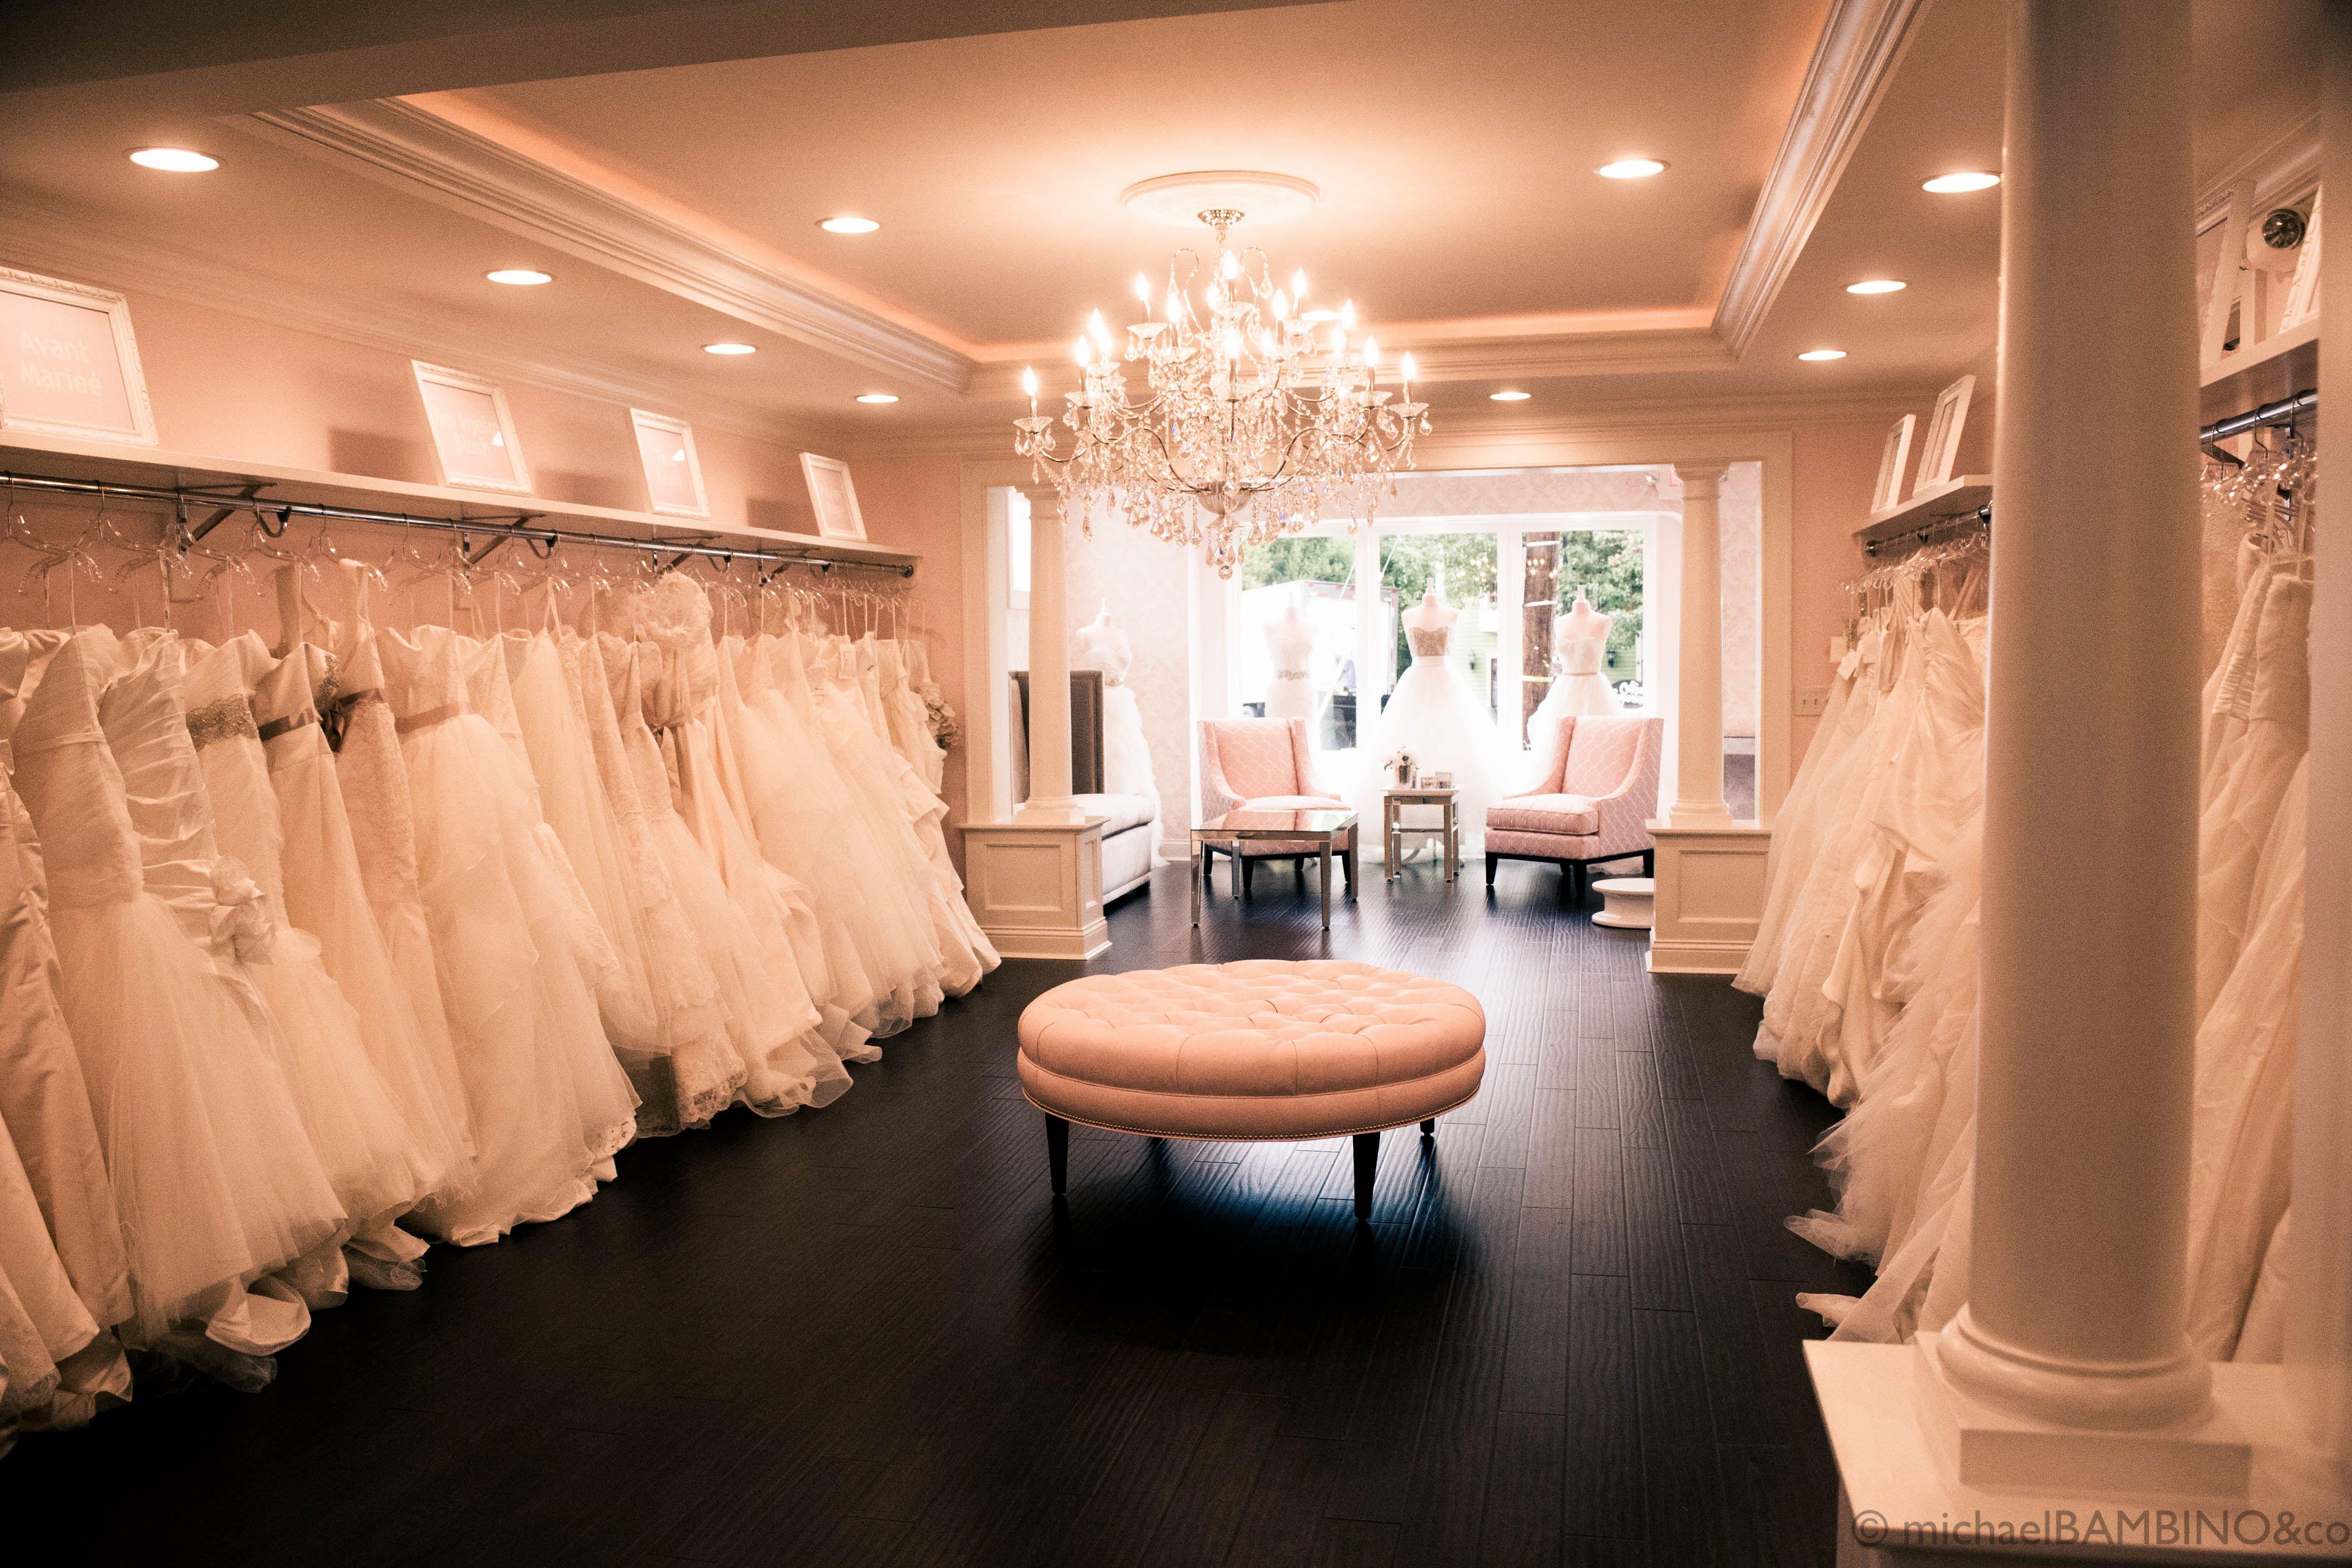 Cheap Wedding Dresses Des Moines Iowa: Cincinnati, OH #HydeParkBridal